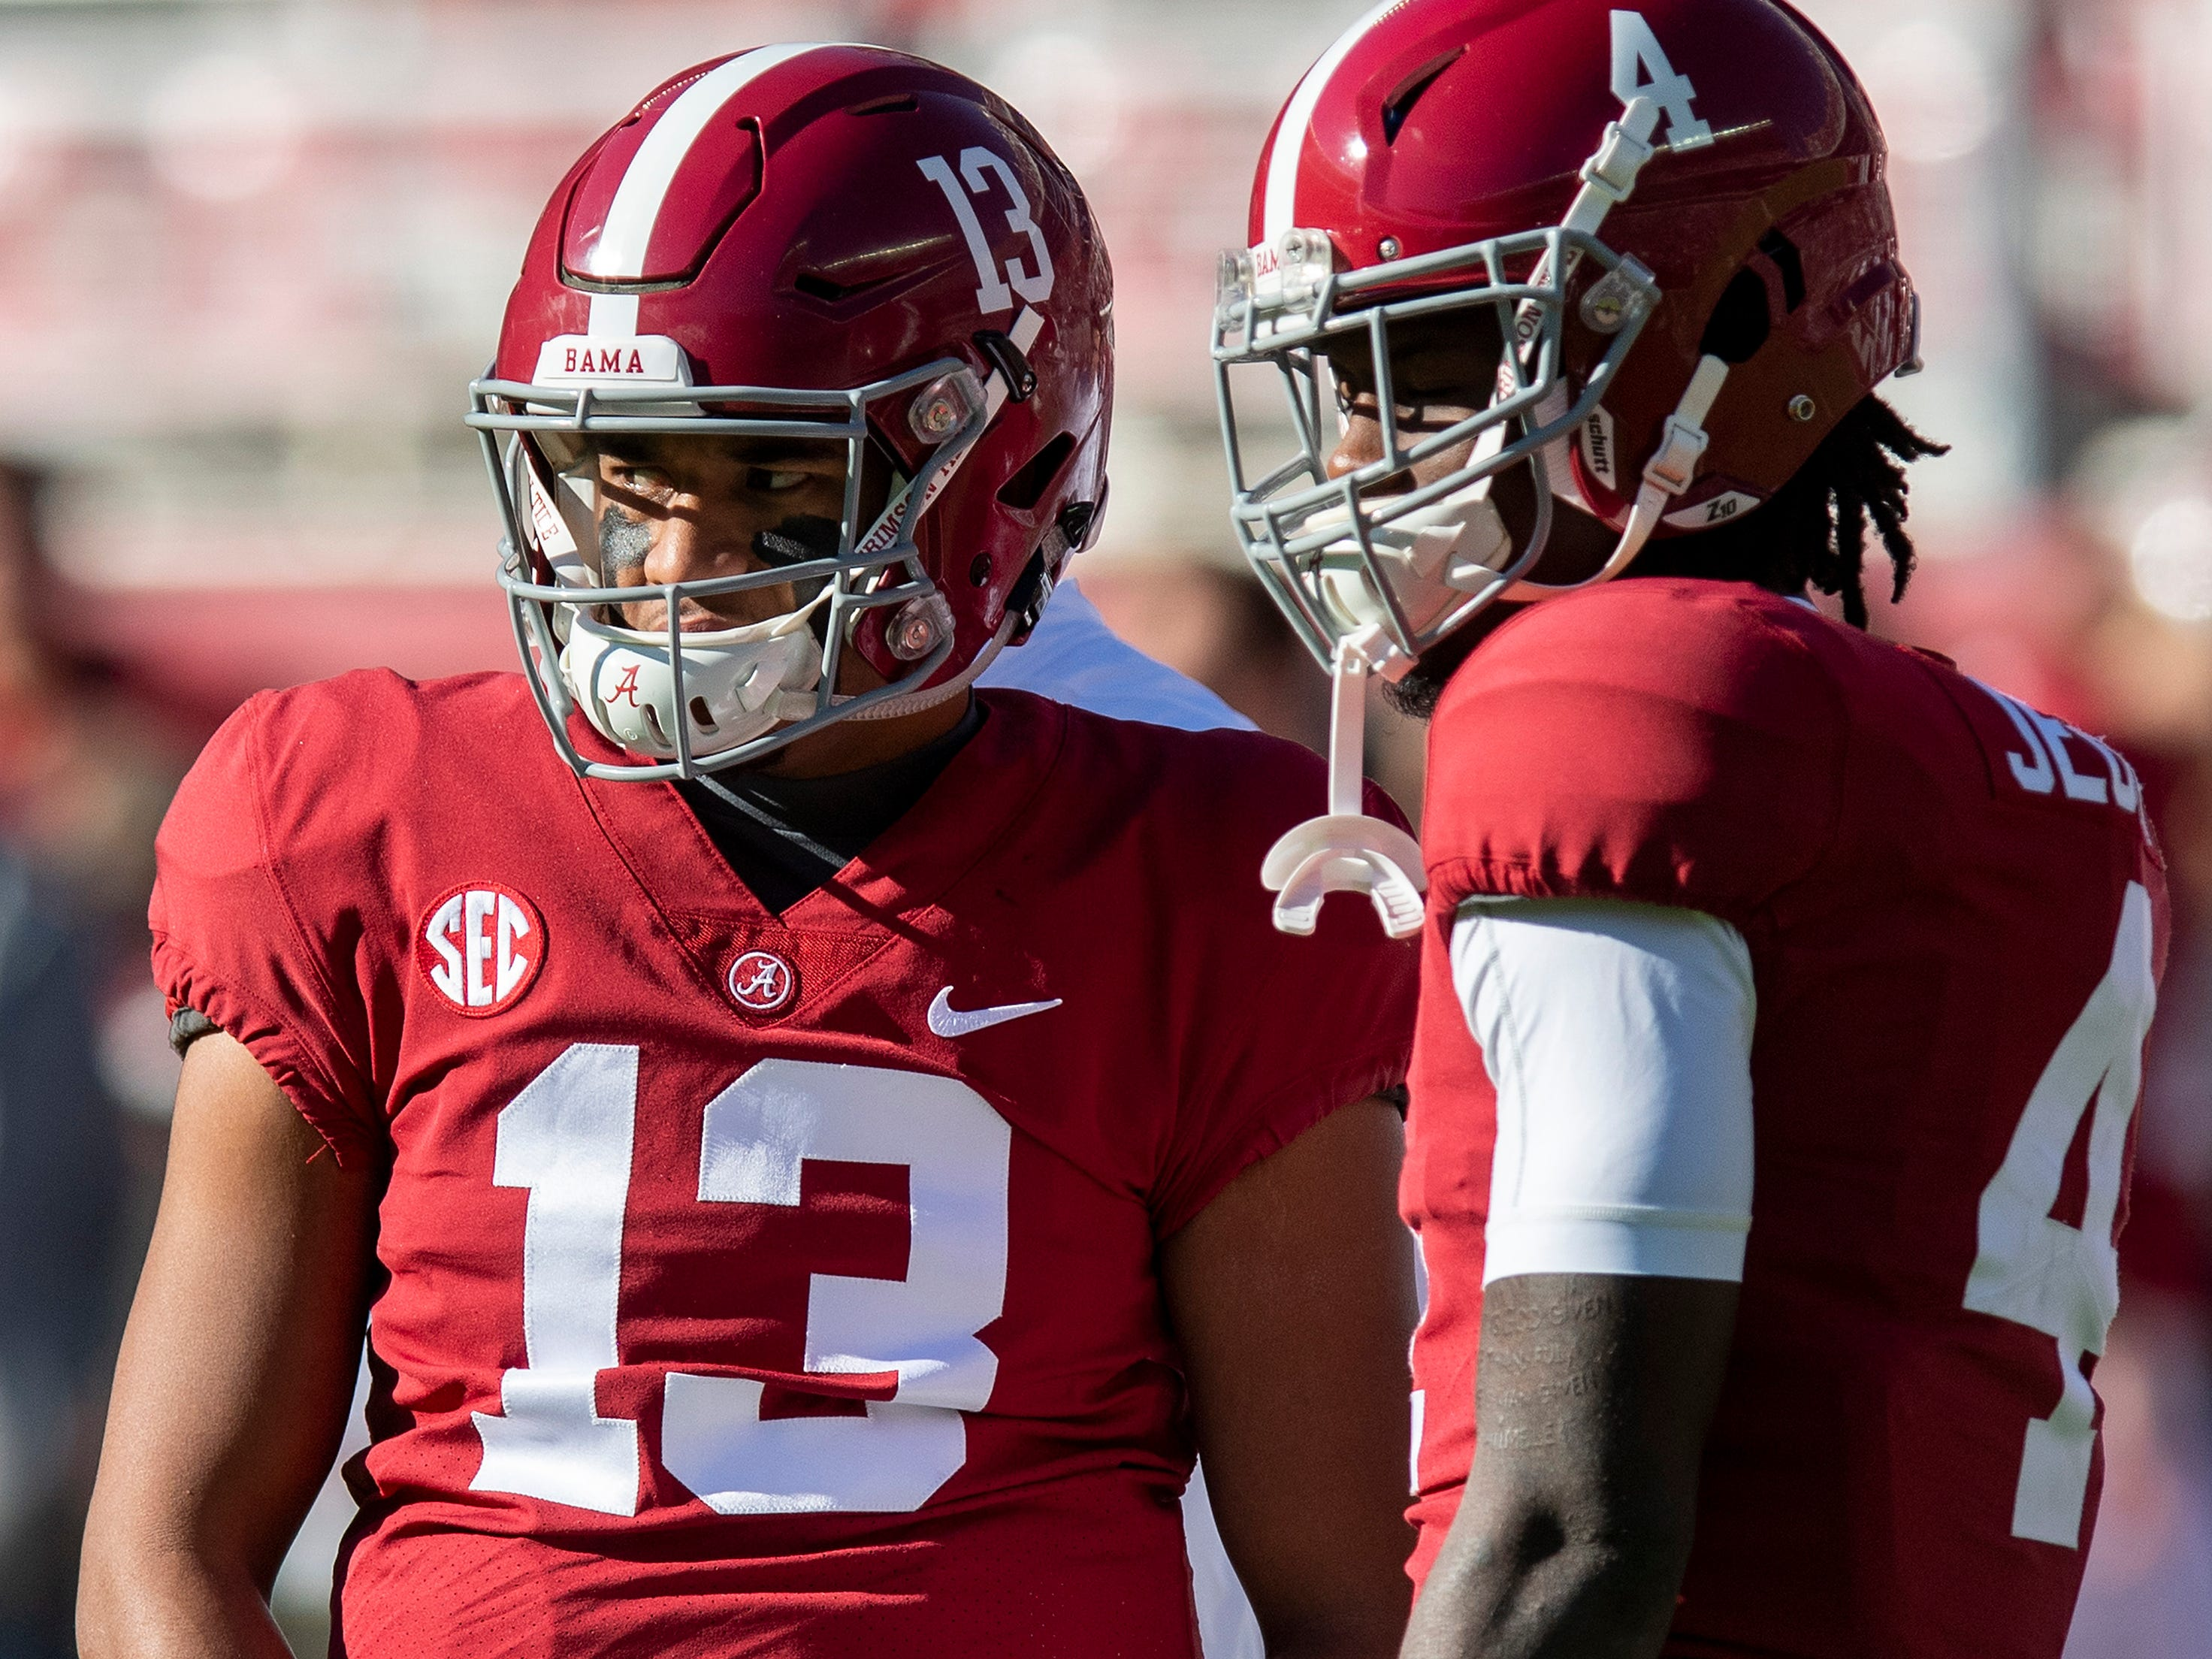 Alabama quarterback Tua Tagovailoa (13) and wide receiver Jerry Jeudy (4) talk before the Alabama vs. Mississippi State game at Bryant Denny stadium in Tuscaloosa, Ala., on Saturday November 9, 2018.